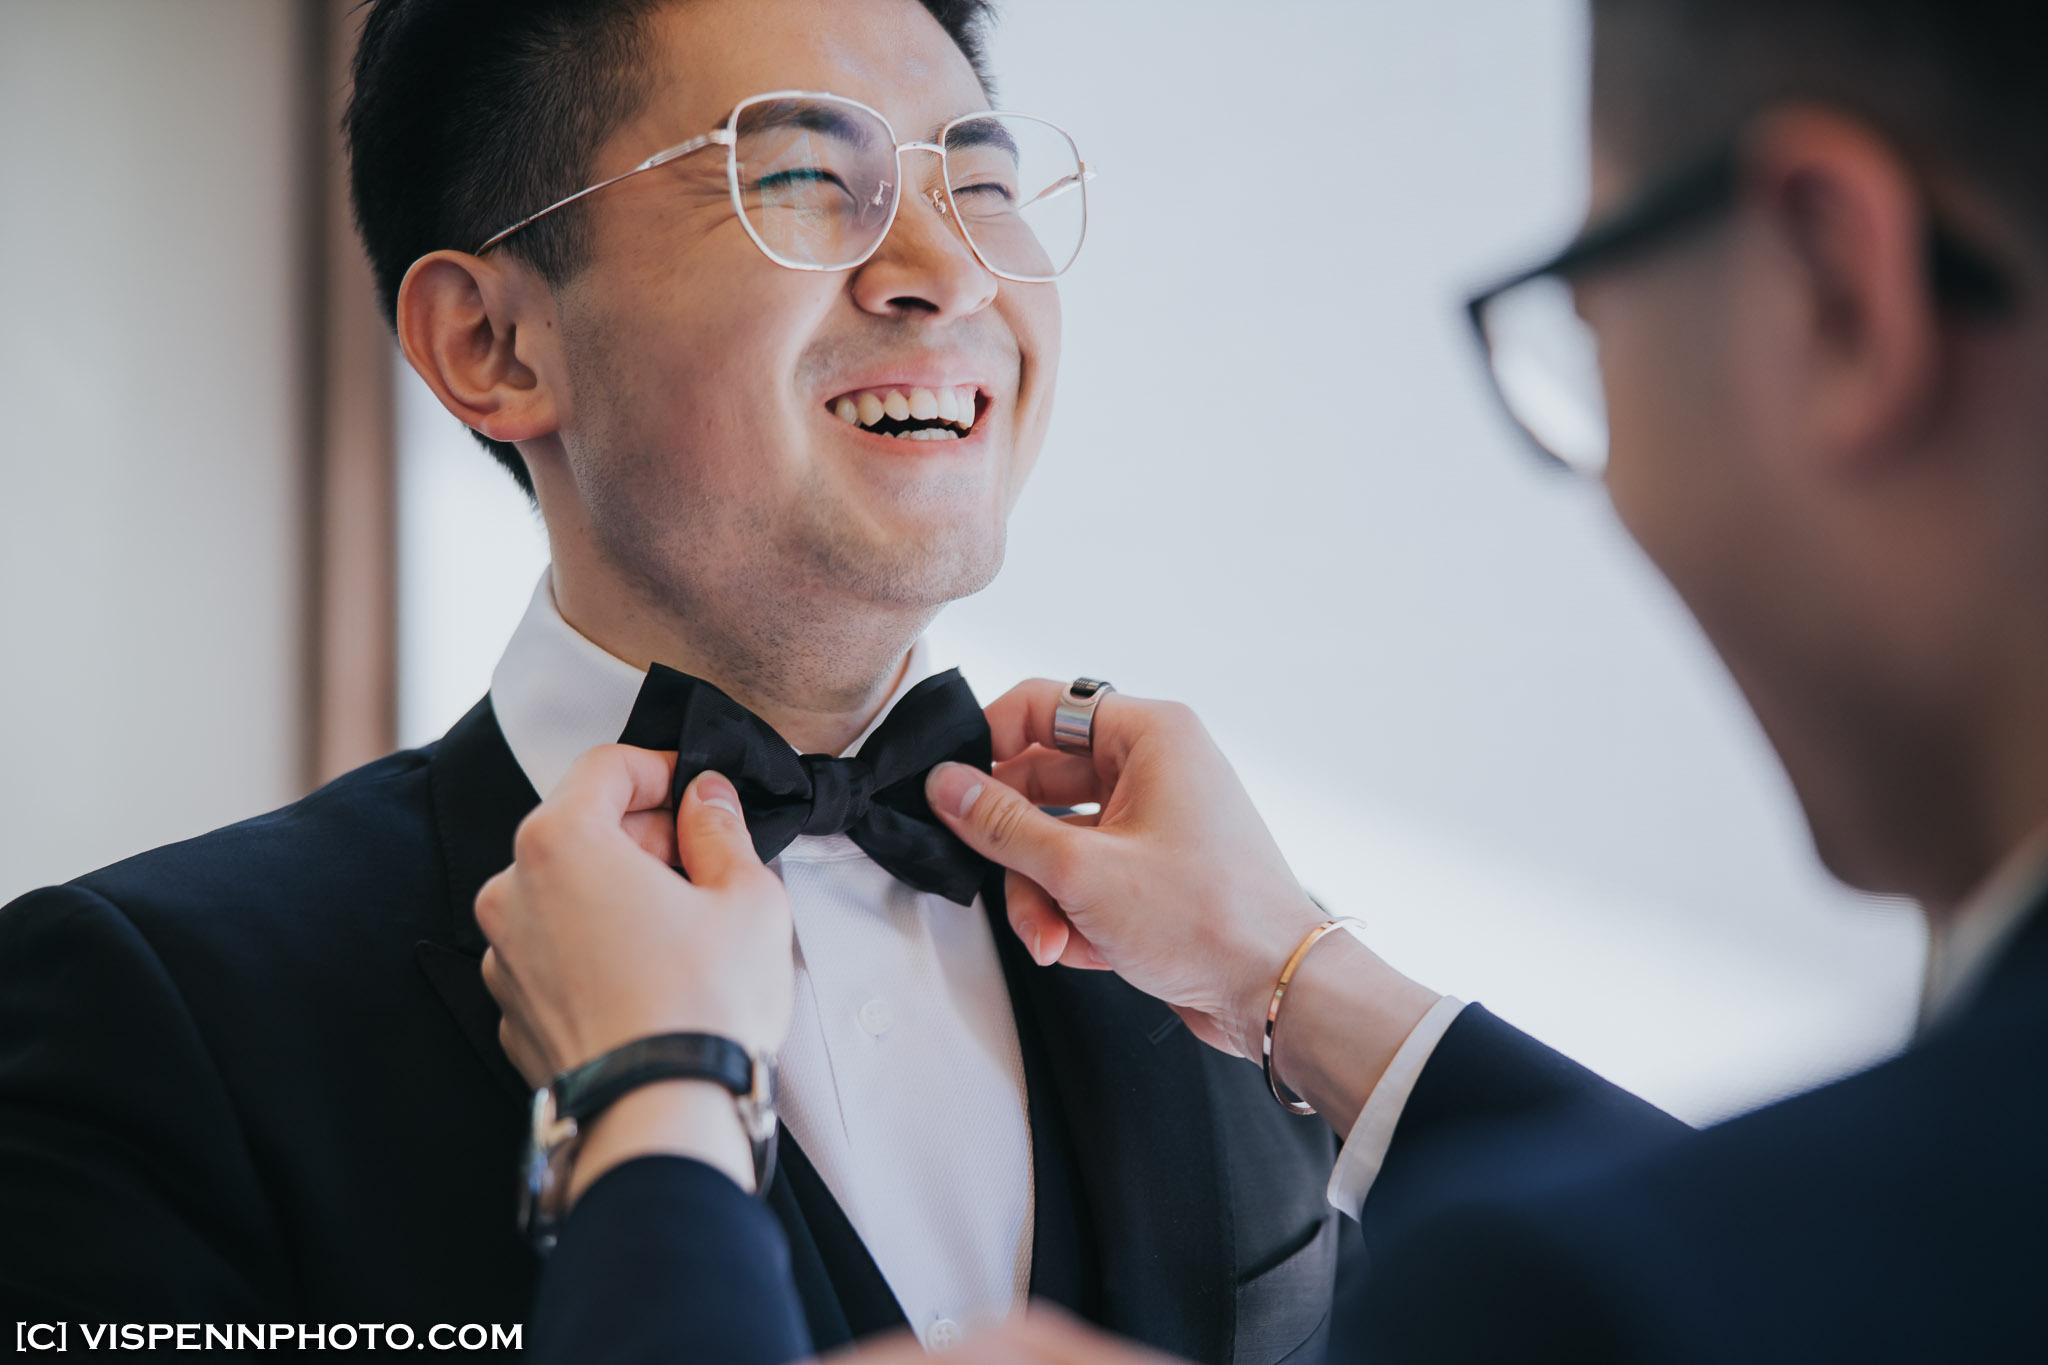 WEDDING DAY Photography Melbourne ElitaPB 04623 1P EOSR ZHPENN